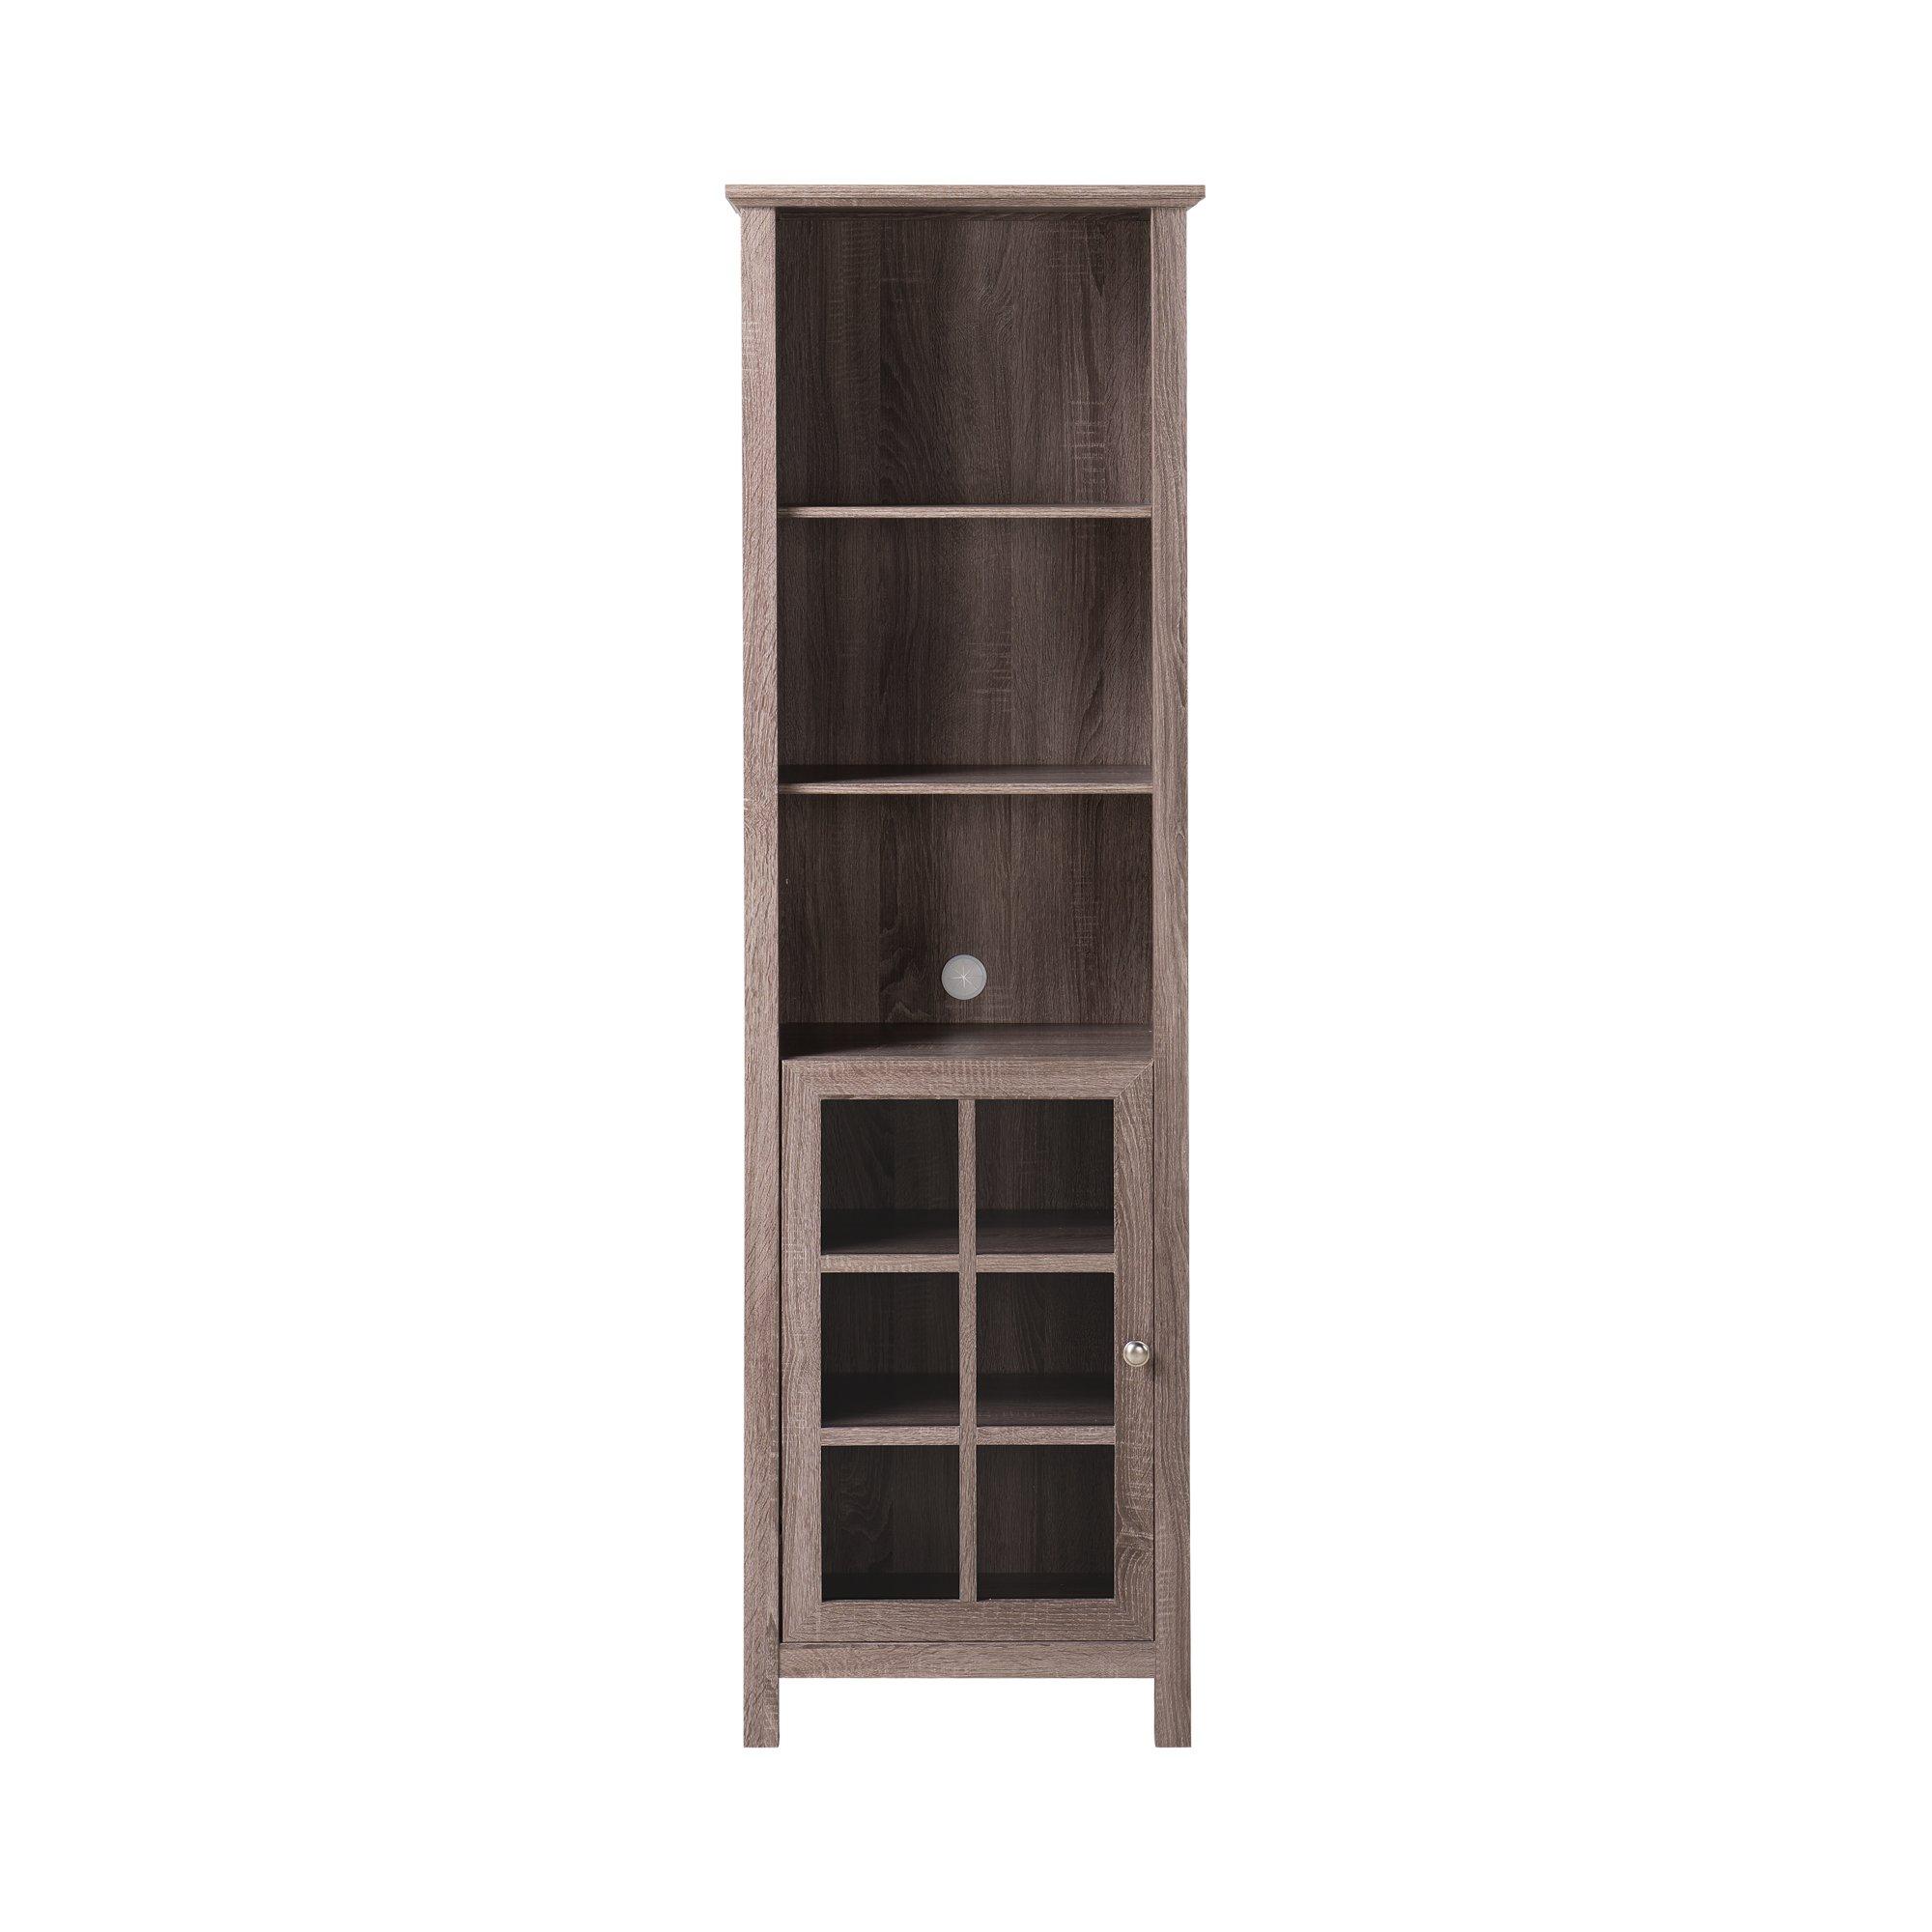 Buy Tall Windowpane Maple Finish Bookcase Media Storage